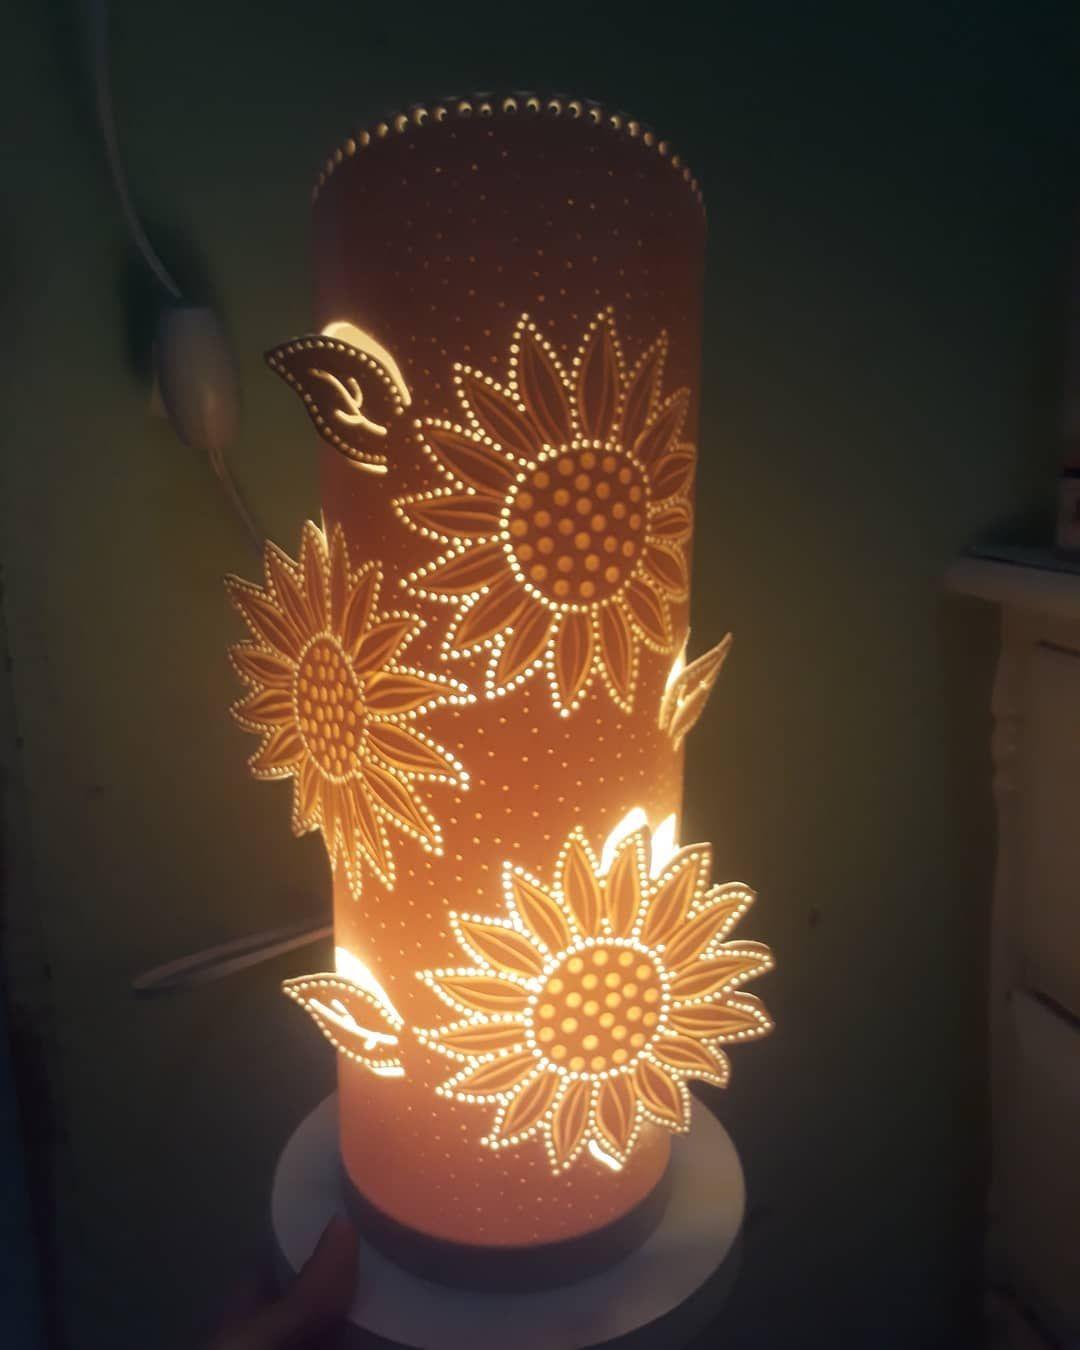 Luminaria Girassol Encomendas Pelo Whatsapp 85987165370